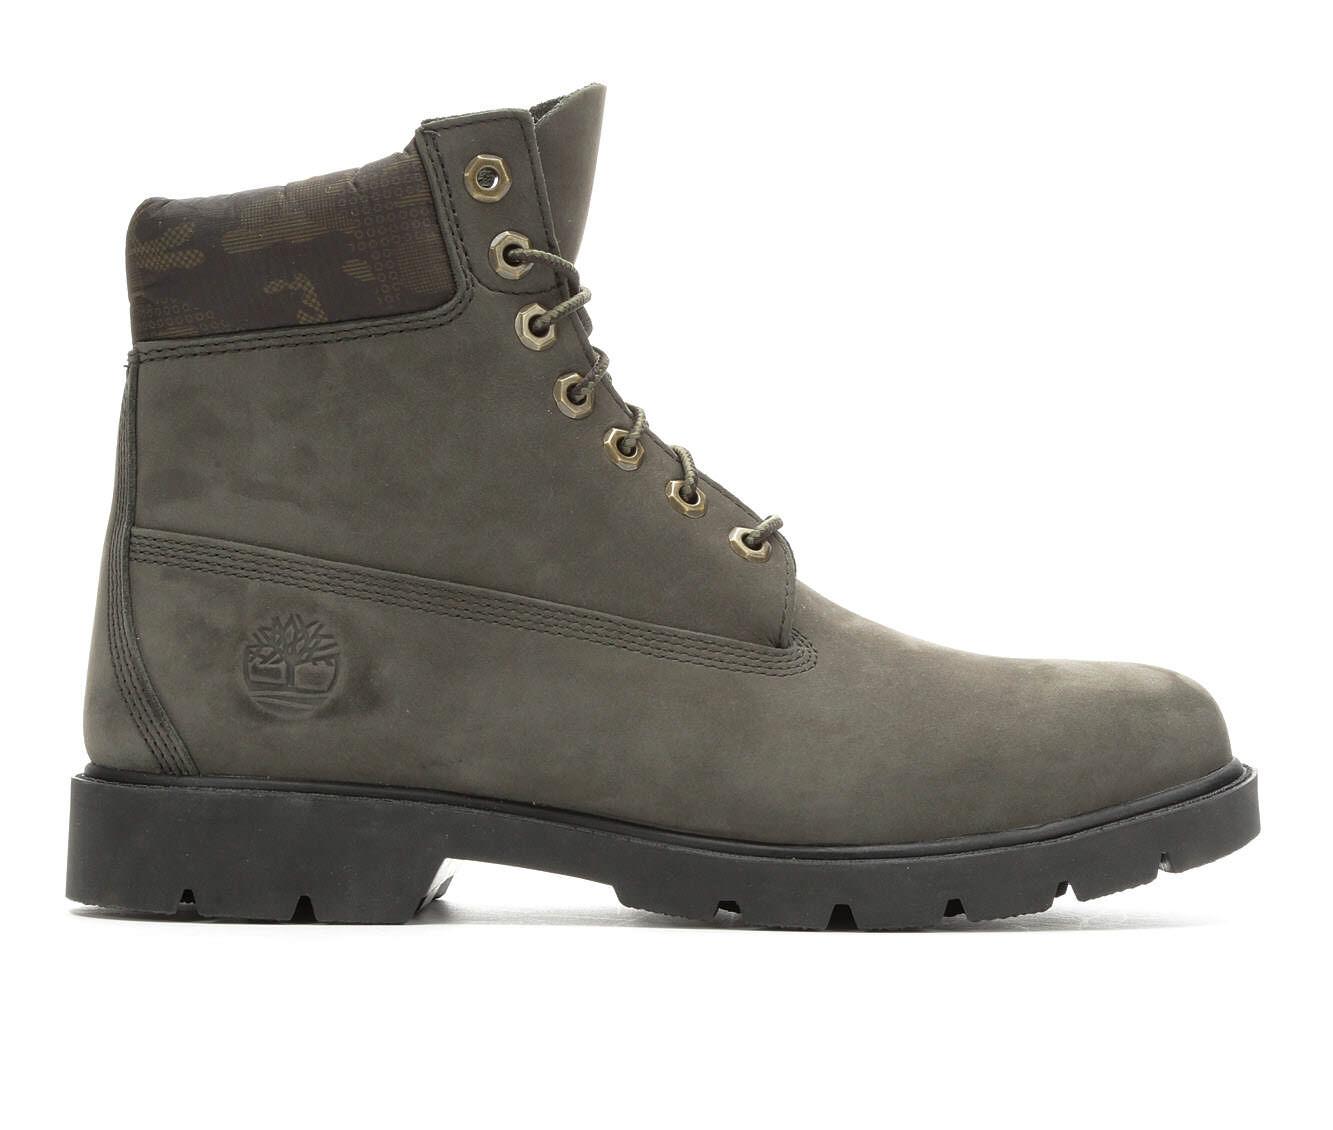 Men's Timberland 6 Inch Padded Camo Collar Boots Peat Nubuck